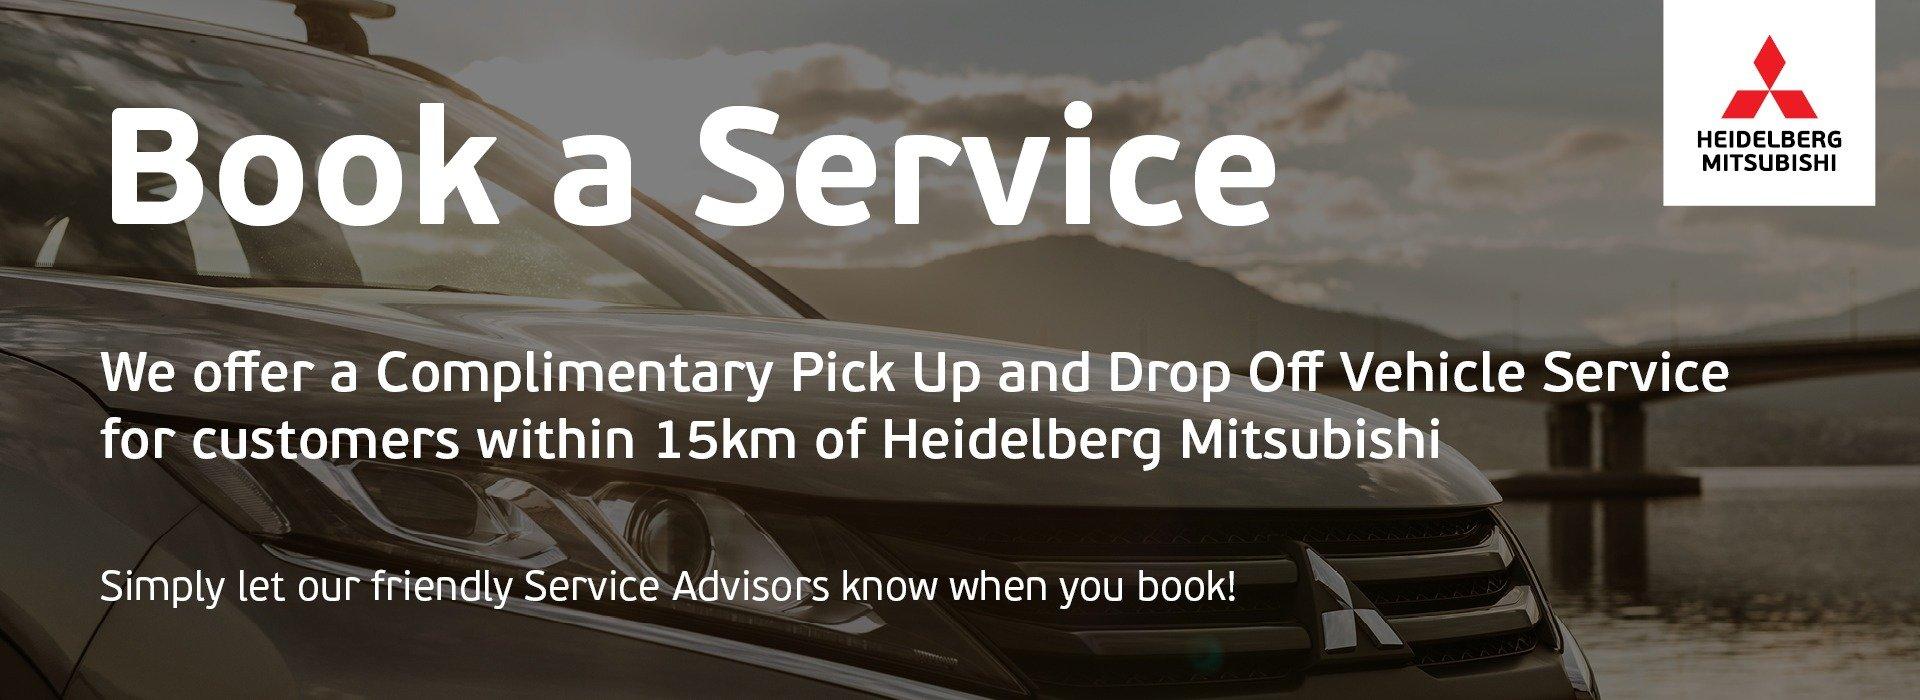 Mitsubishi Dealer Melbourne - Heidelberg Mitsubishi